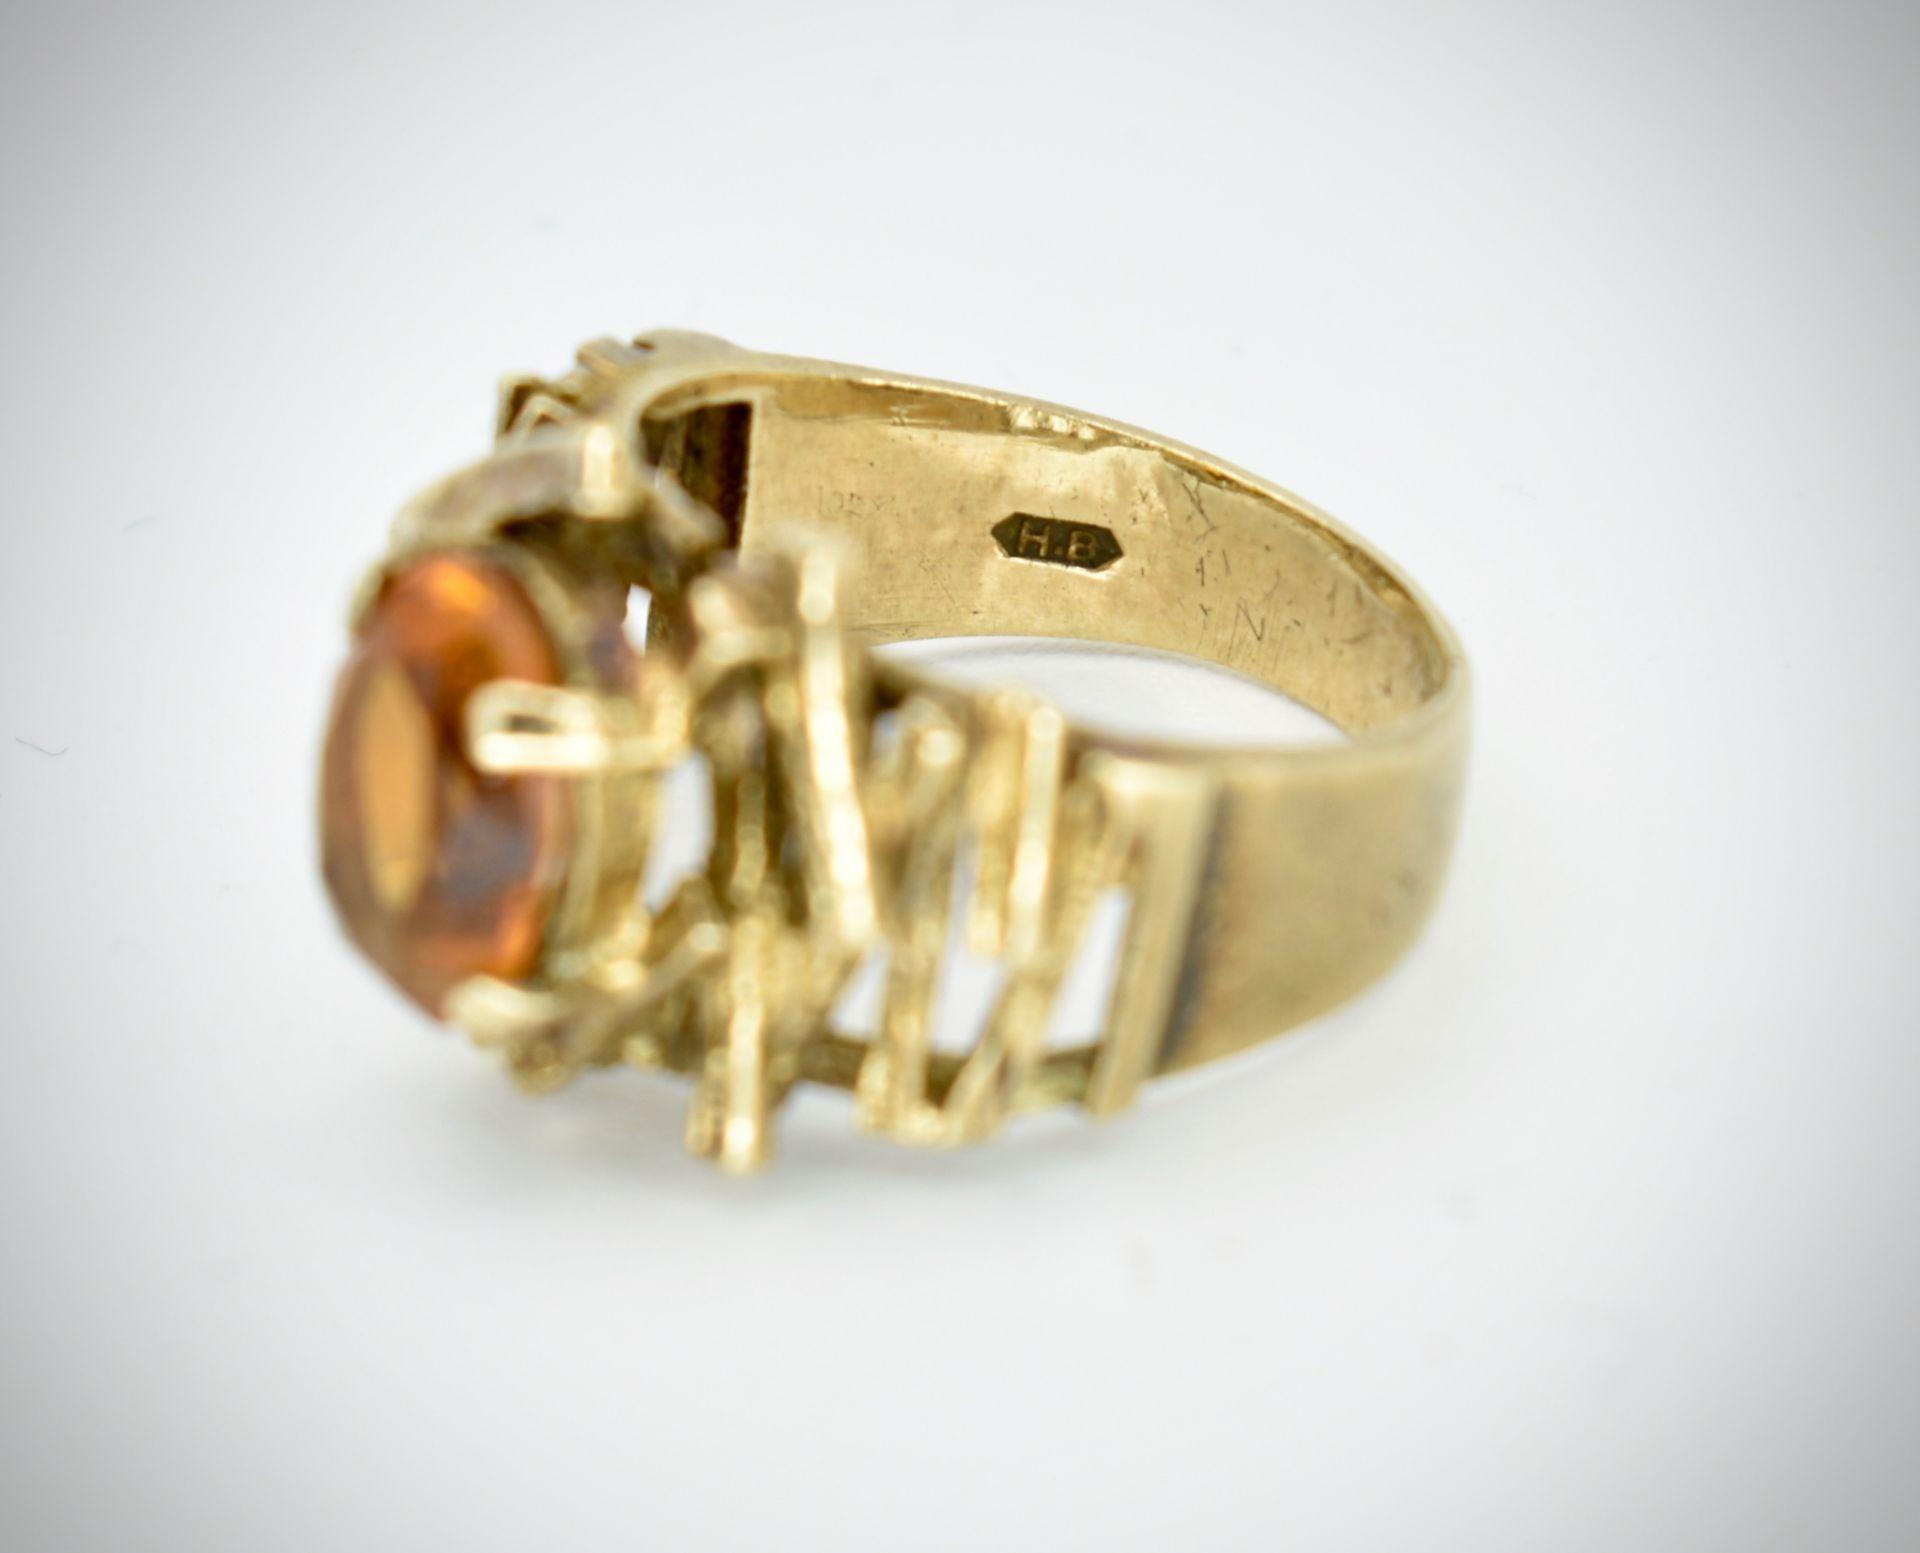 9ct Gold & Citrine Hallmarked 1960's Designer Ring - - Image 6 of 6